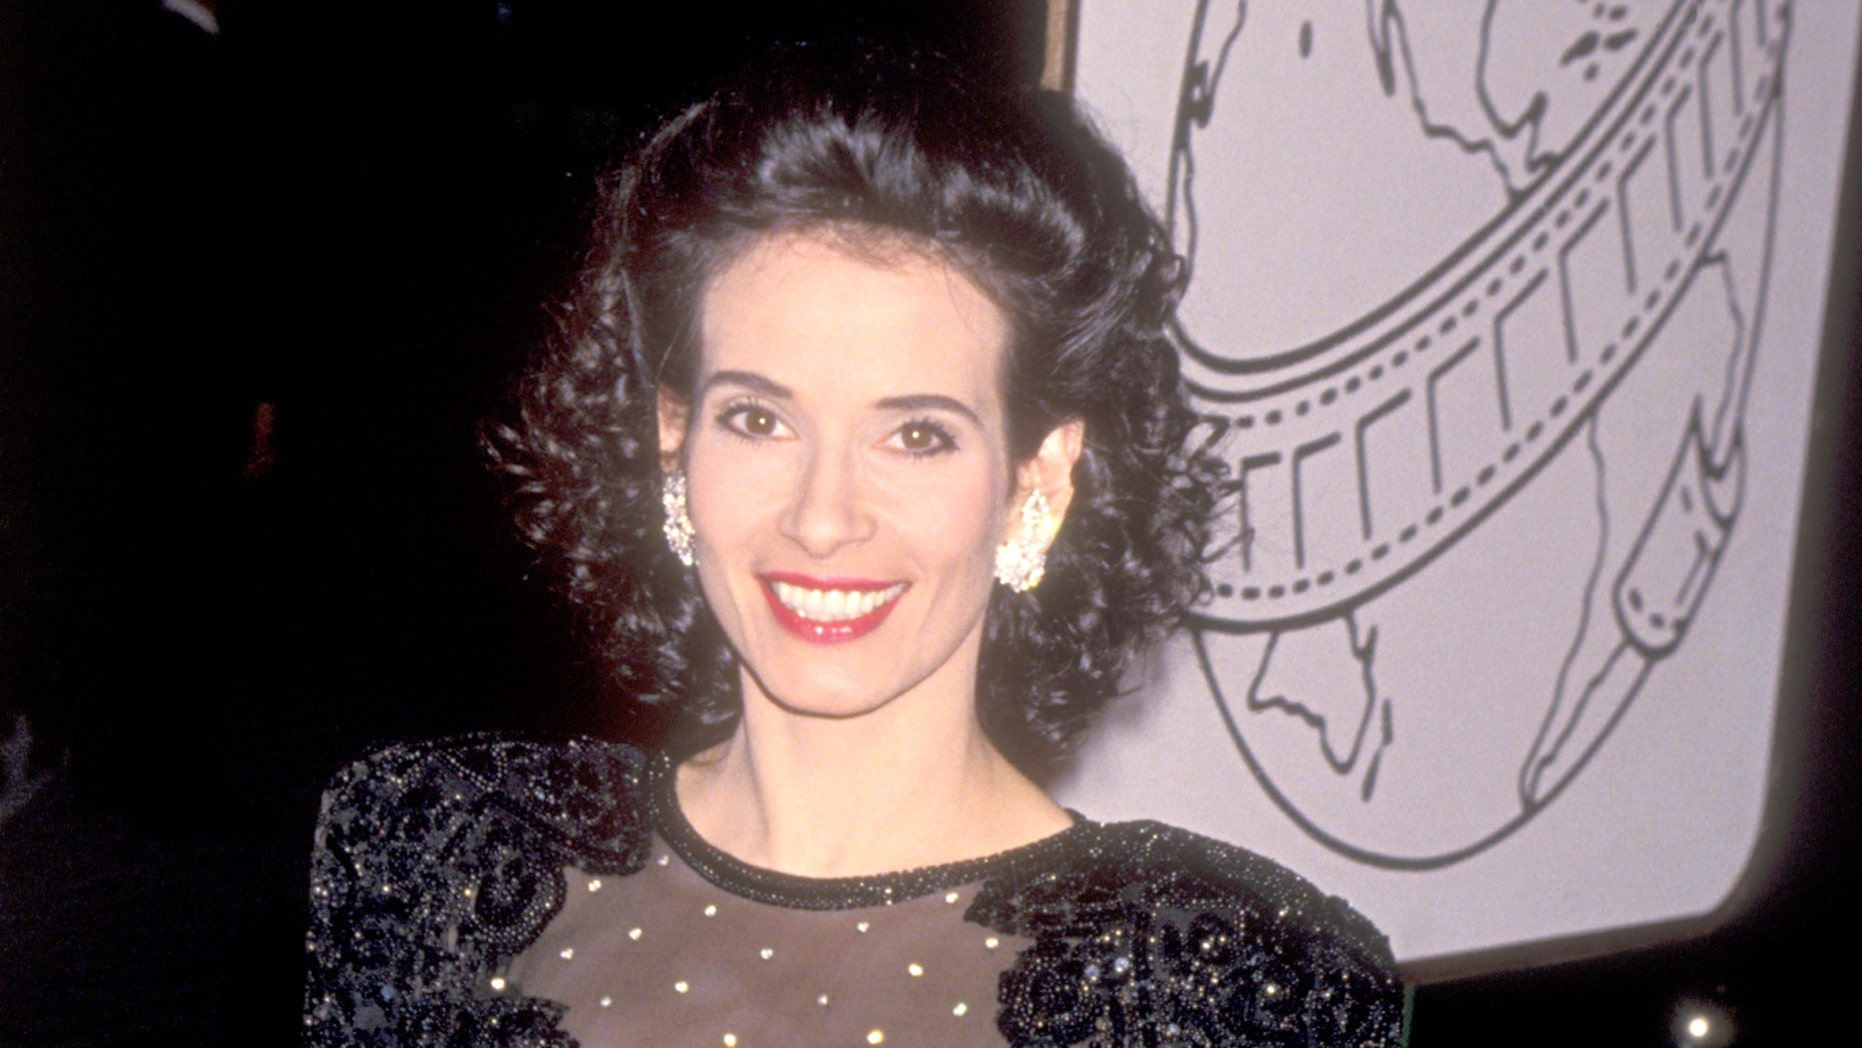 Theresa Saldana at the Golden Globe Awards on January 22, 1994 in Beverly Hills, California.